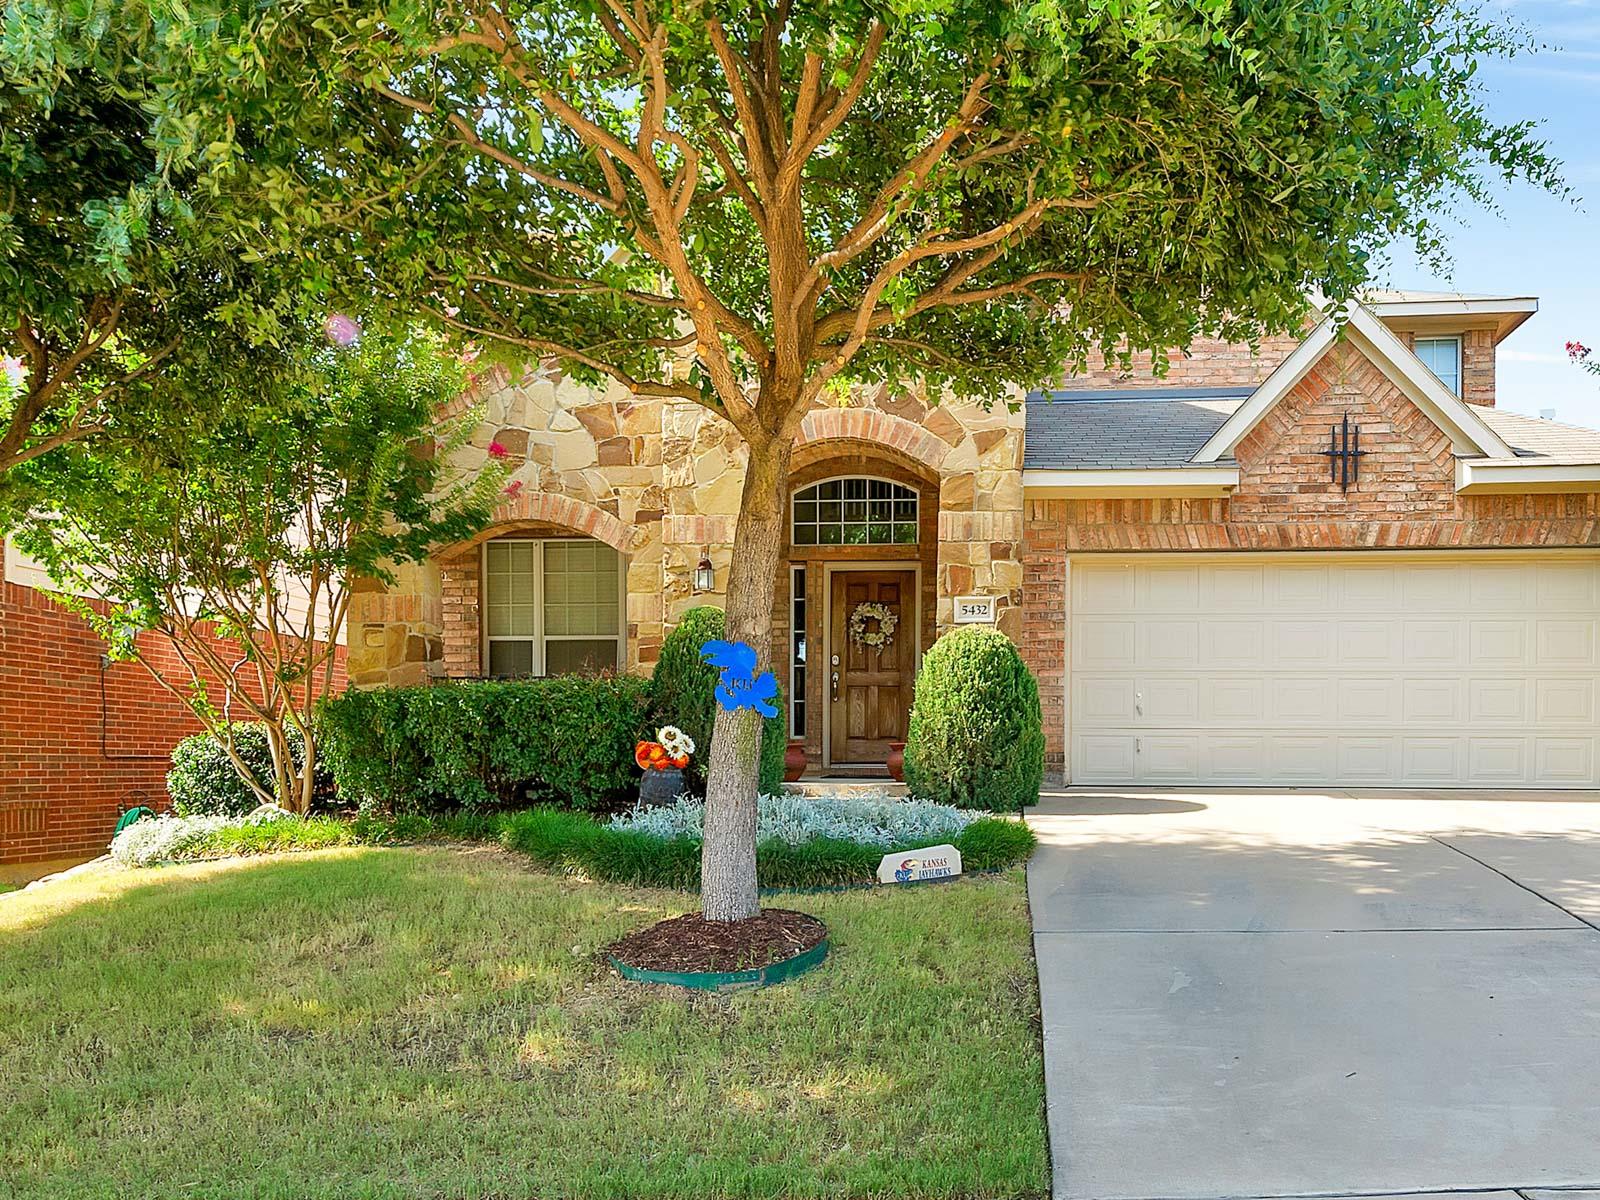 独户住宅 为 销售 在 5432 Old Orchard Dr, Fort Worth 沃斯堡市, 得克萨斯州, 76123 美国